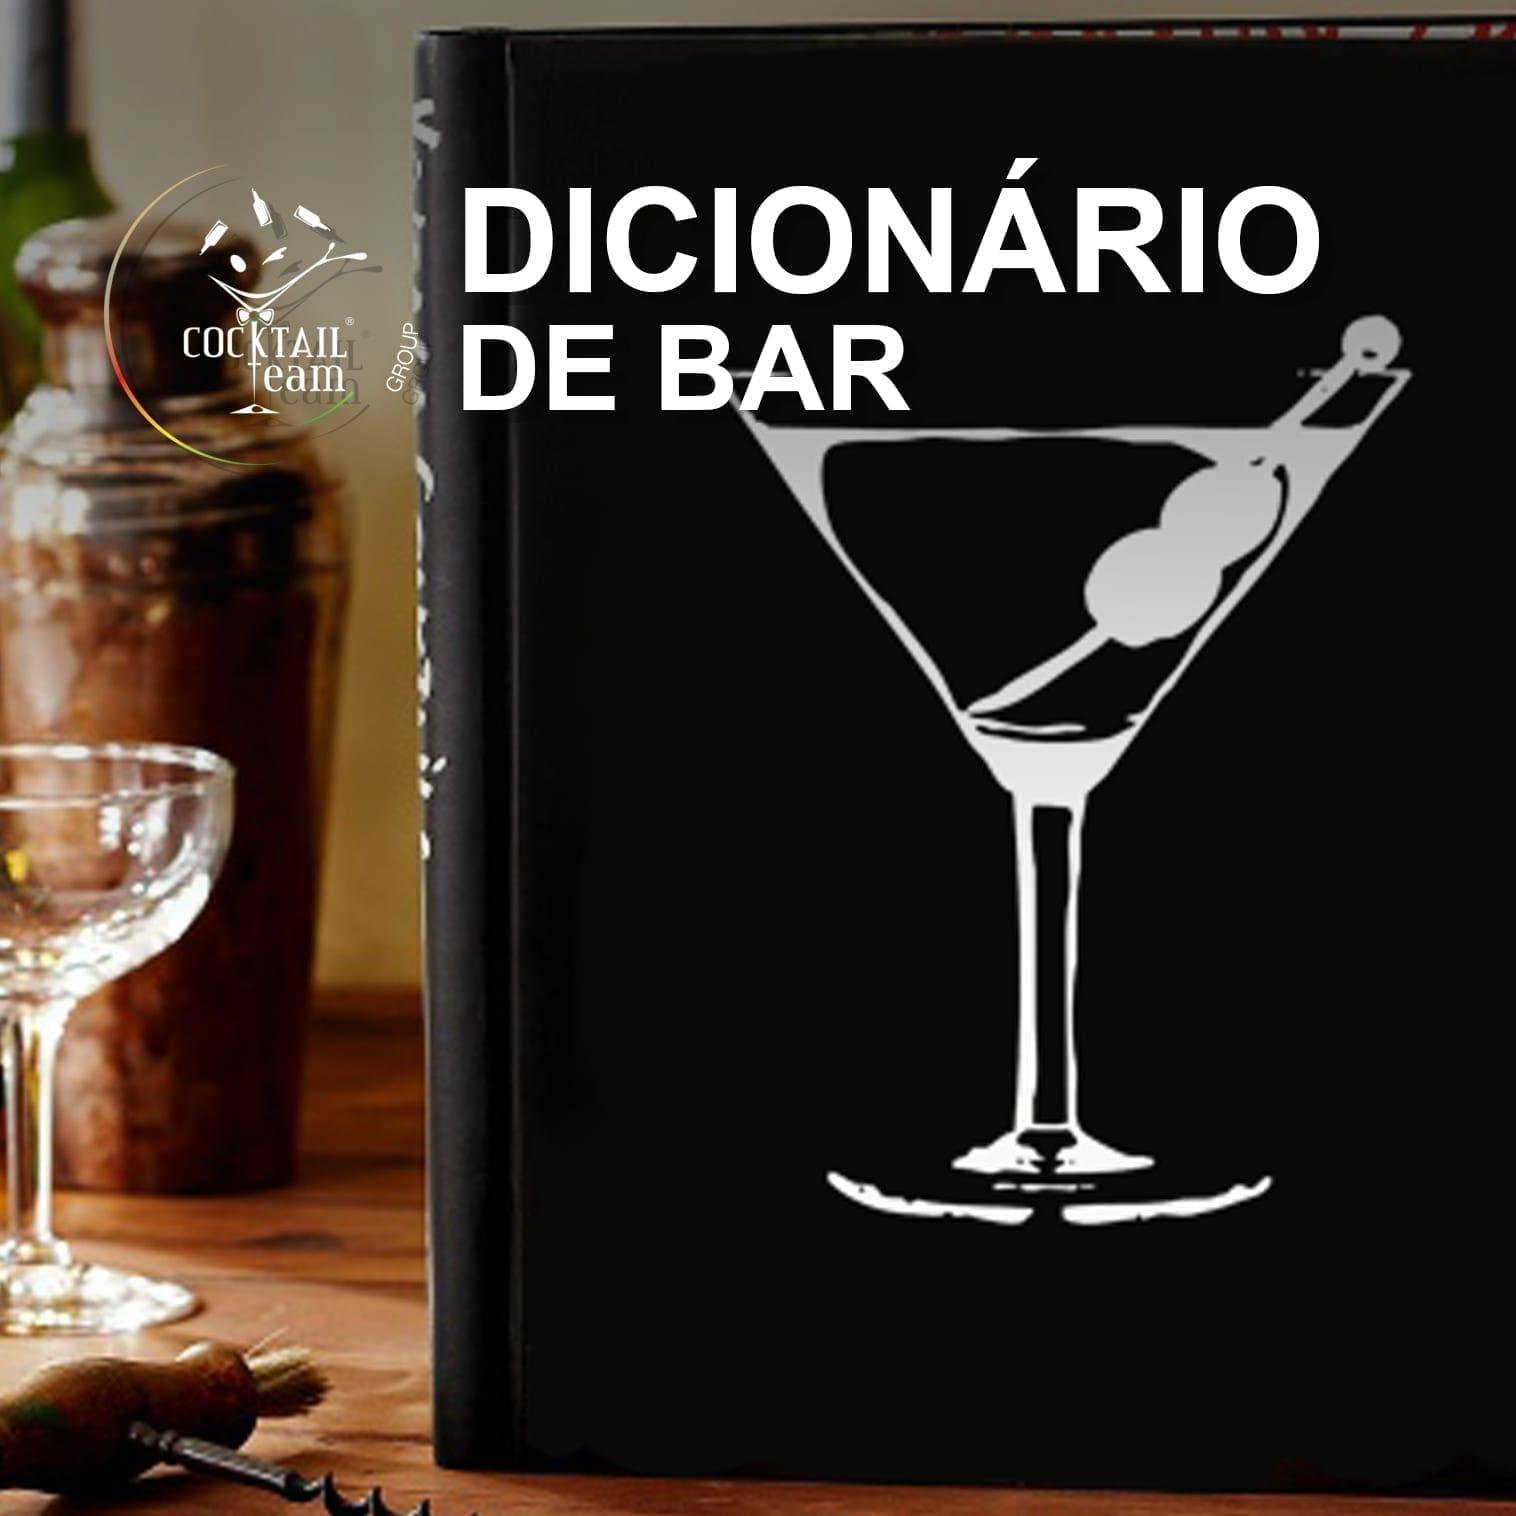 Bar Dictionary